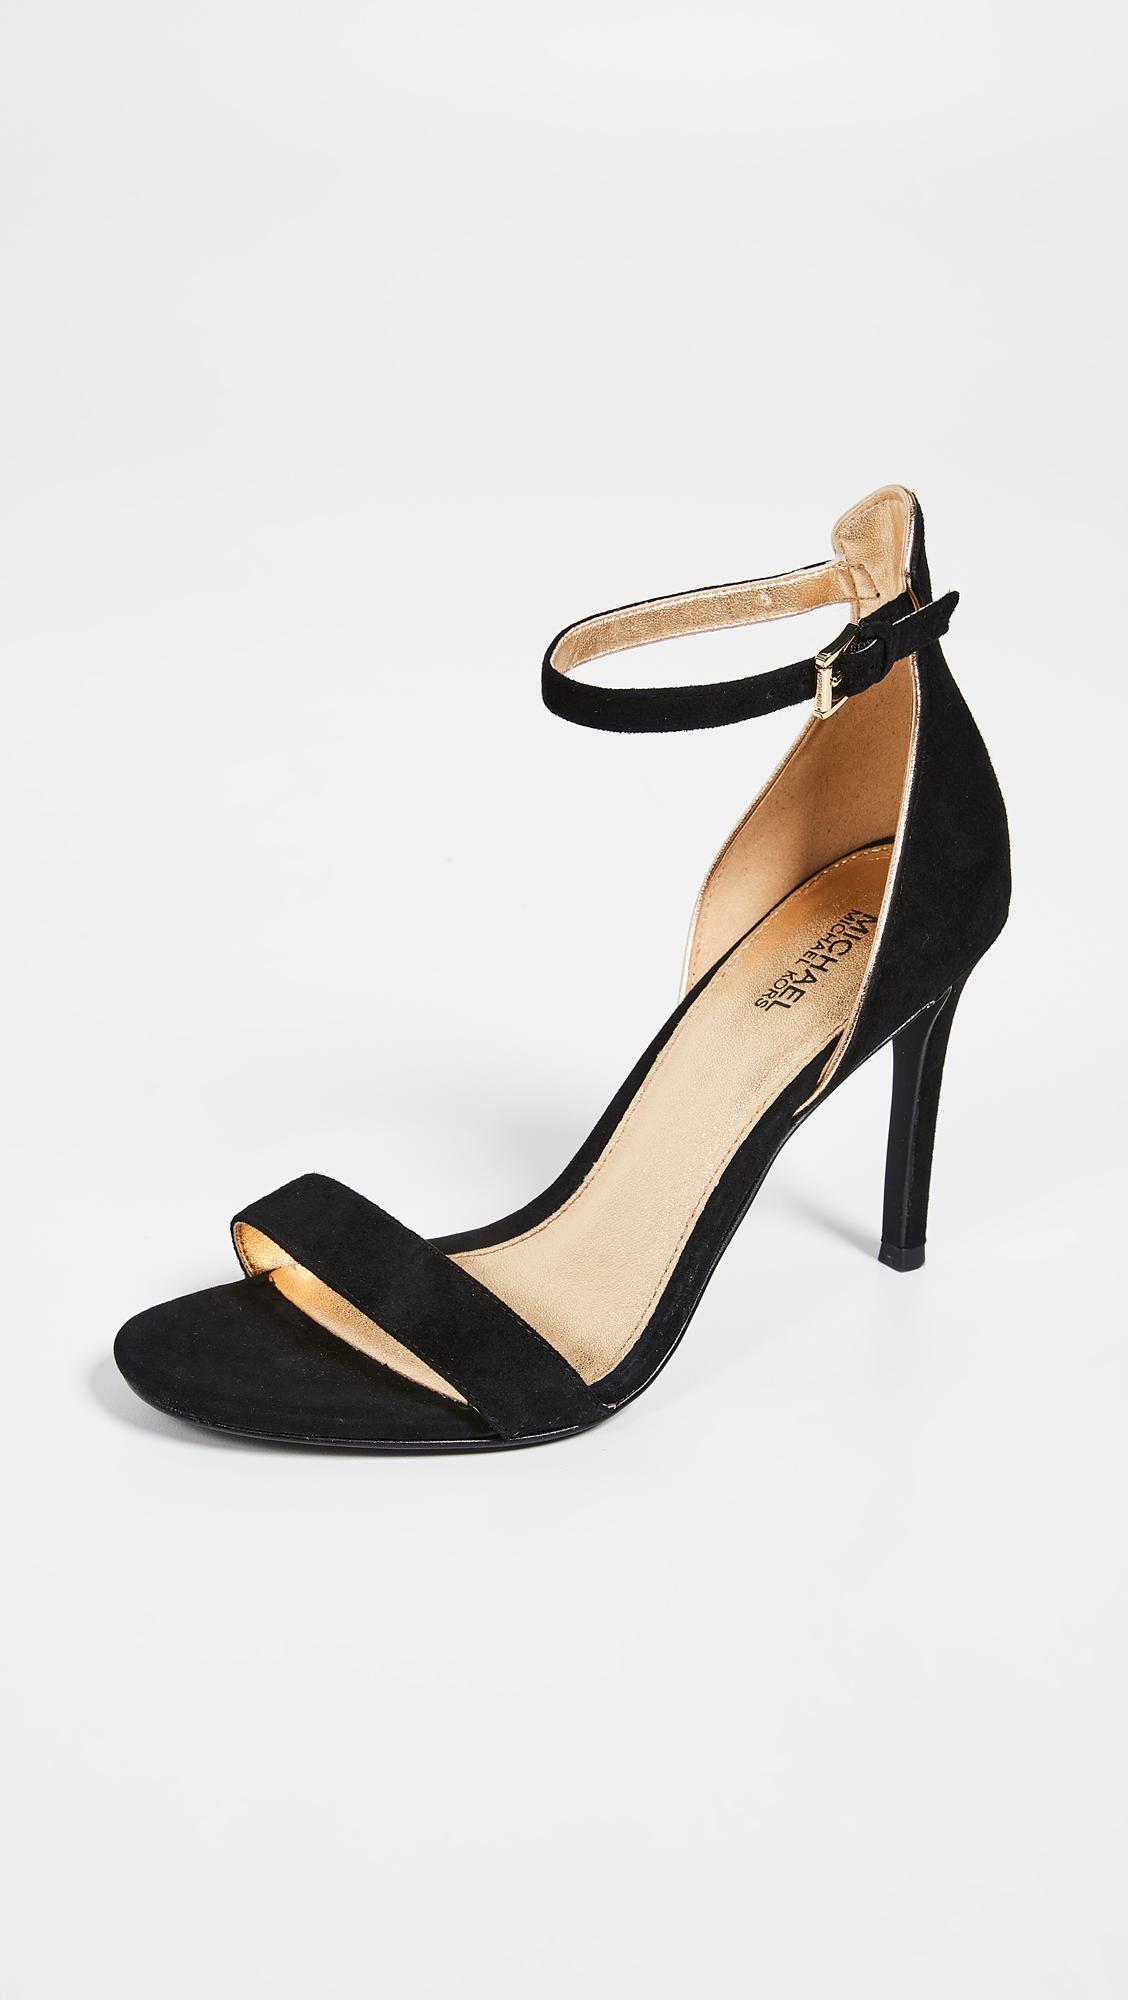 e0a5b396fcb5 MICHAEL Michael Kors Harper Naked Sandals in Black - Lyst